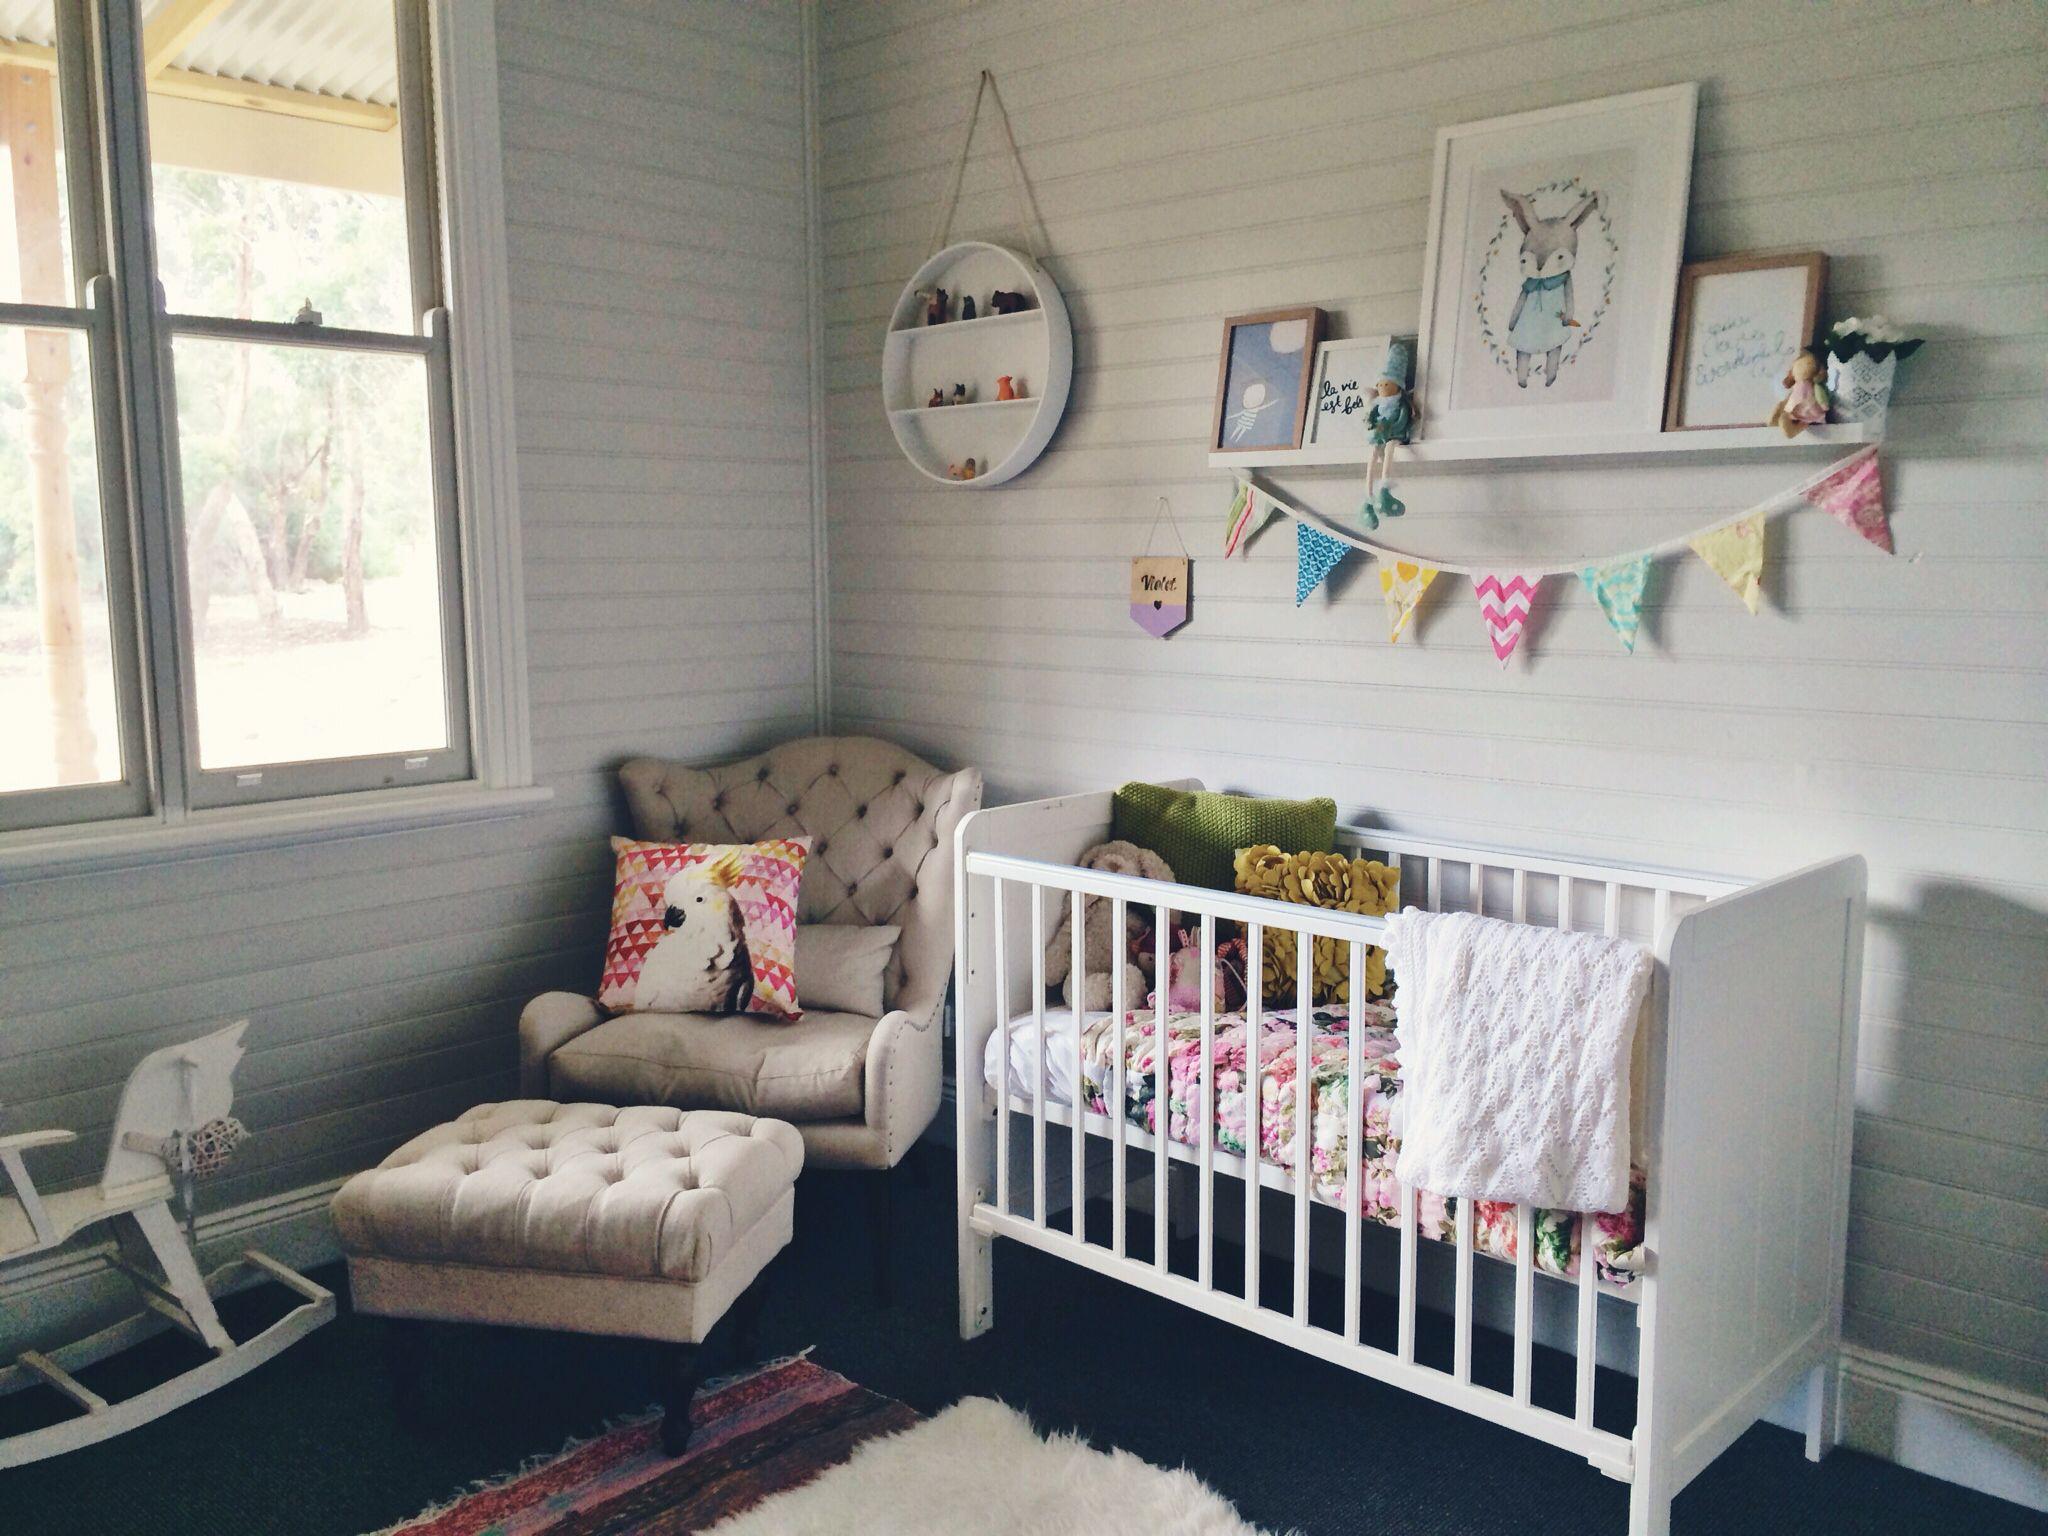 Baby girl nursery design decor interior idea shelf modern country ...